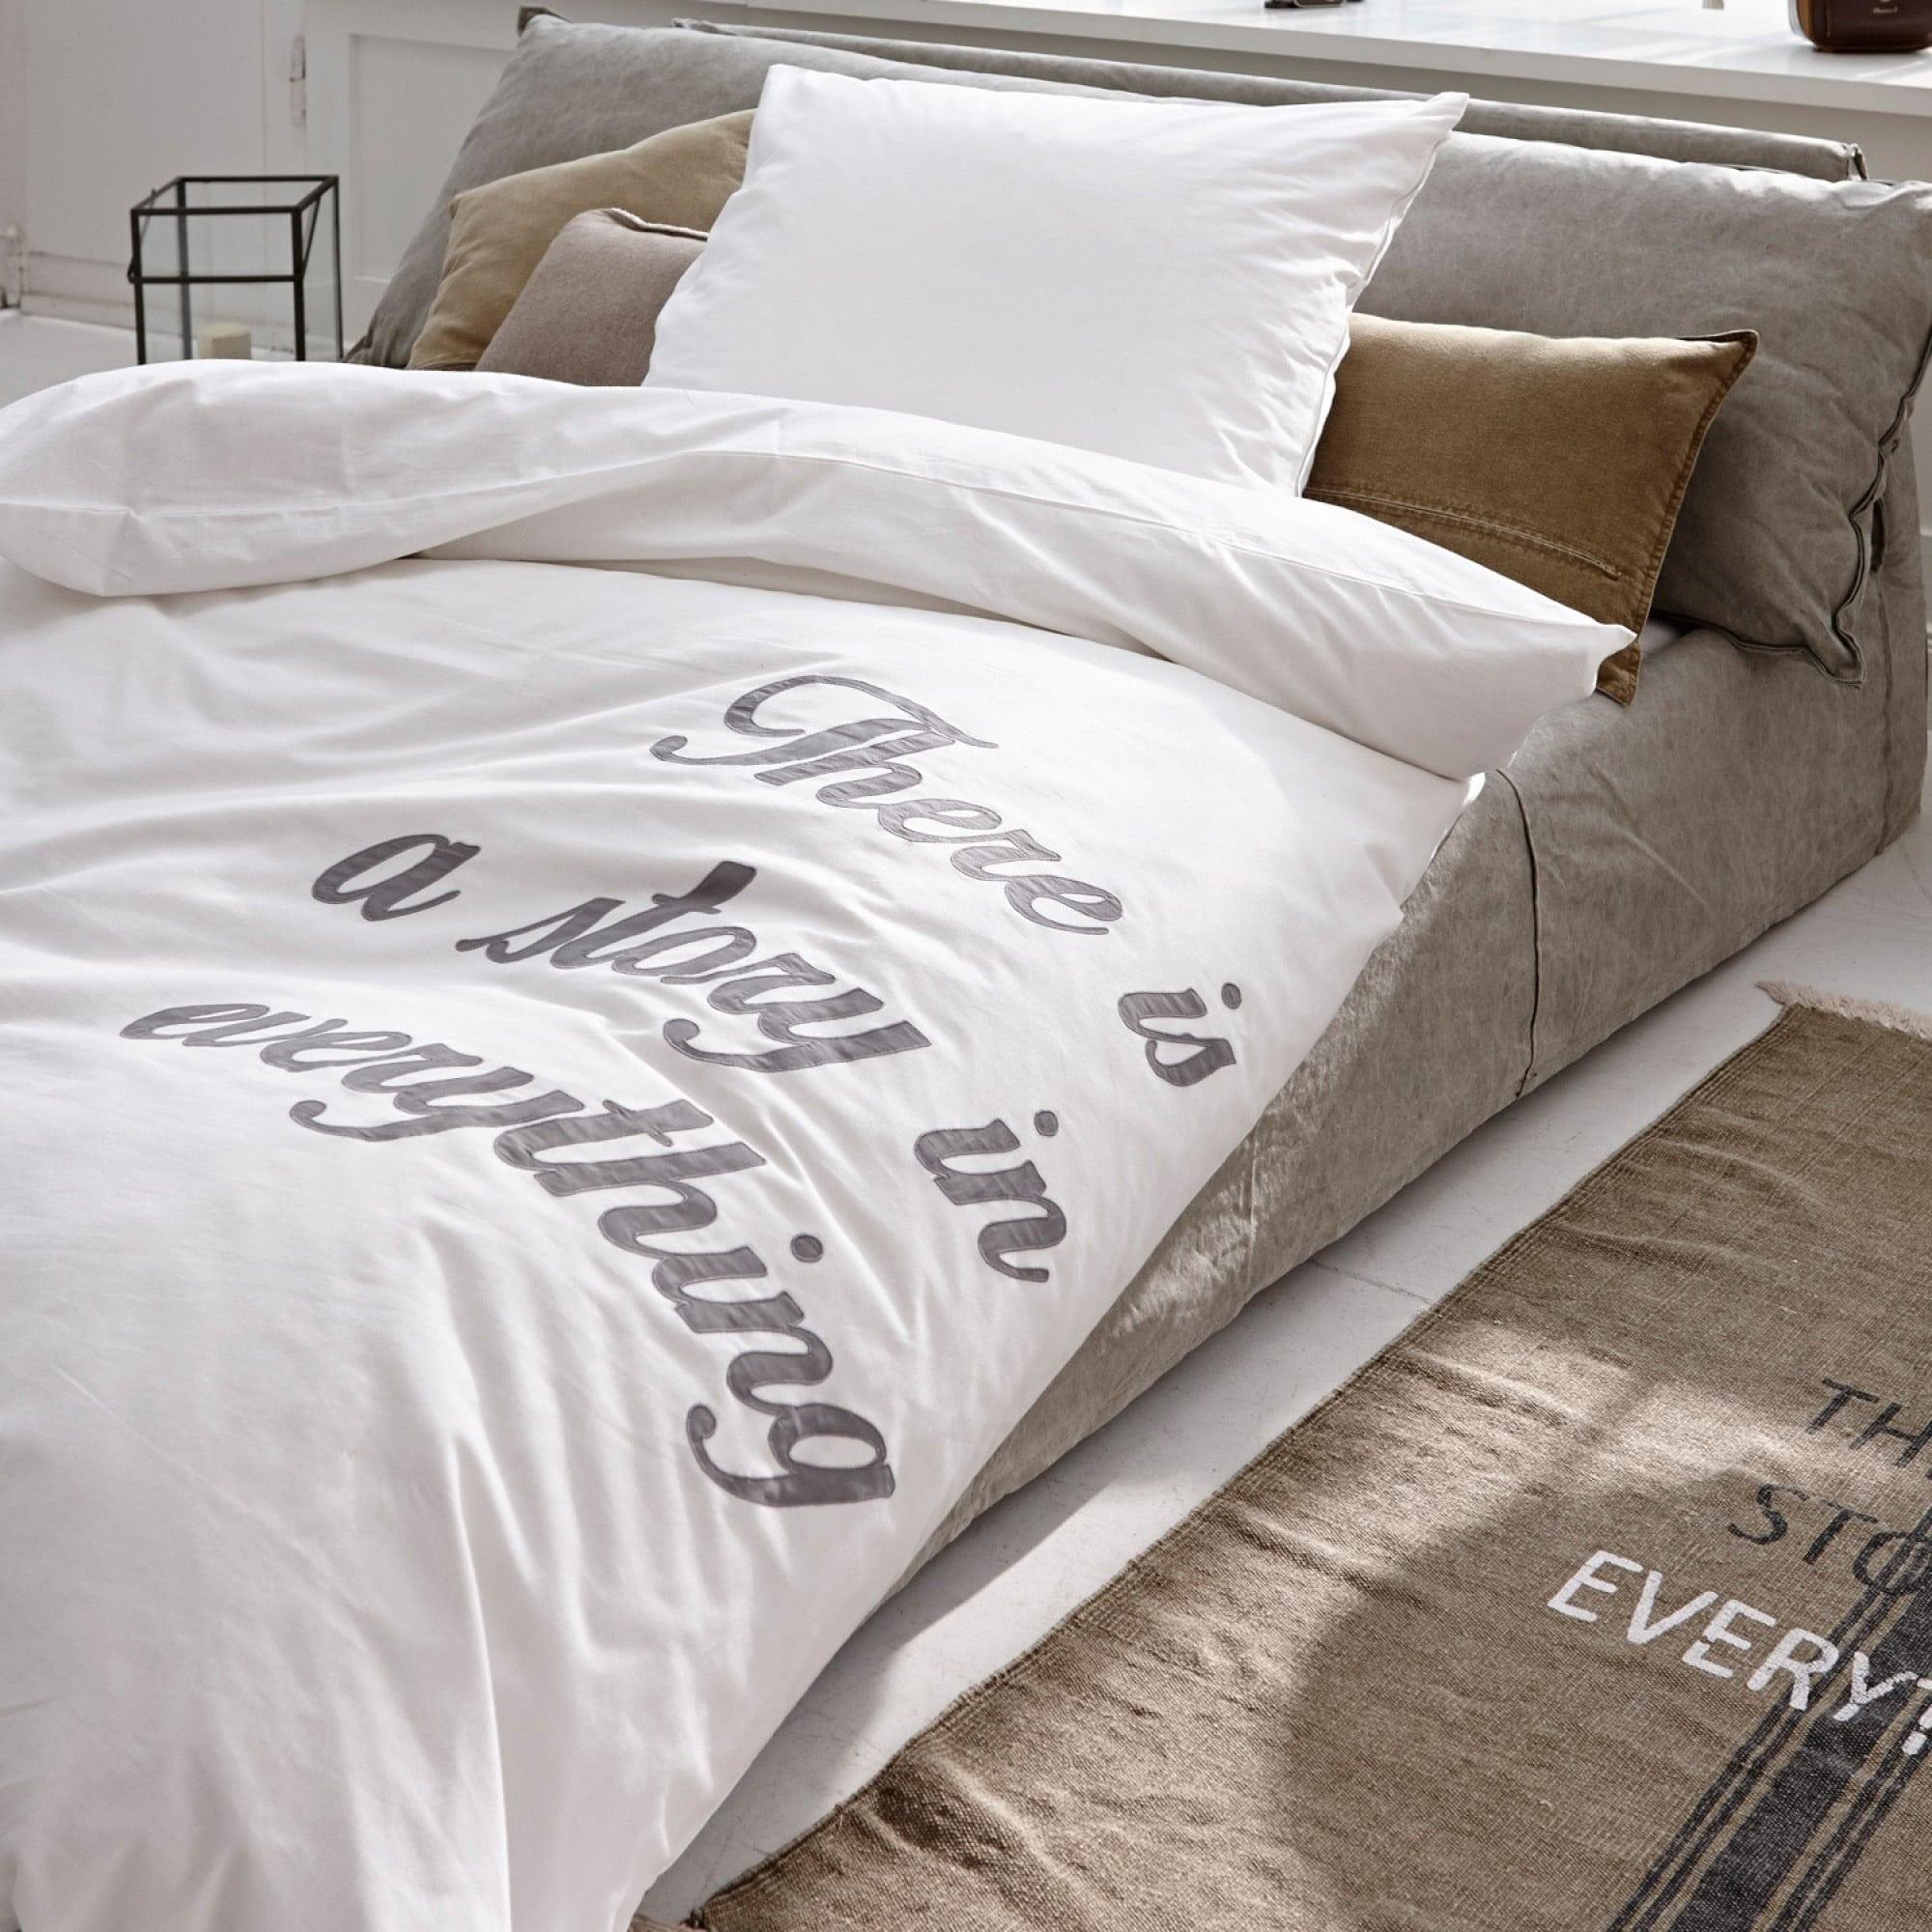 bettw sche wei mit schrift m belideen. Black Bedroom Furniture Sets. Home Design Ideas